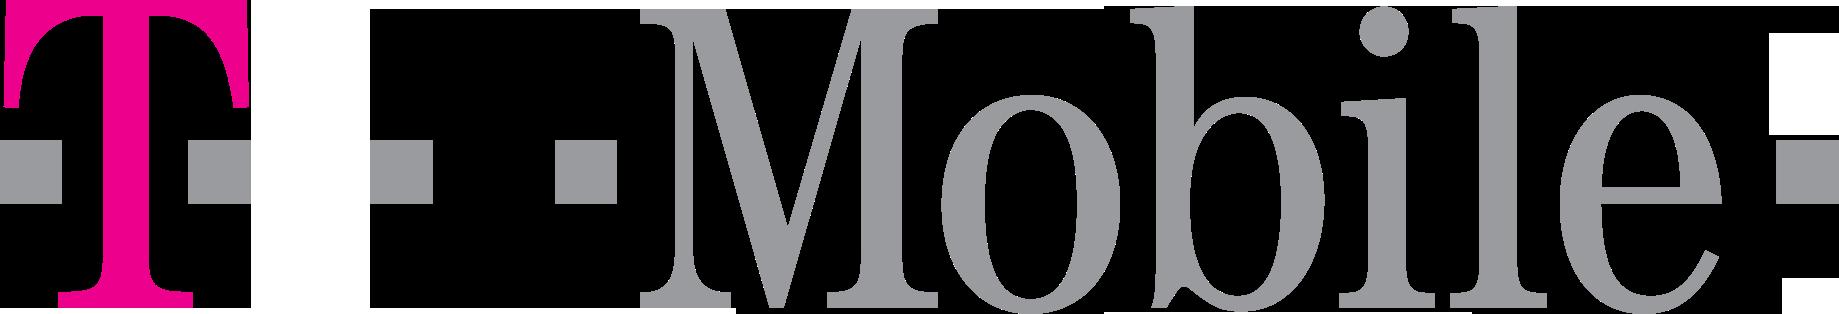 tmobile uk logopedia the logo and branding site